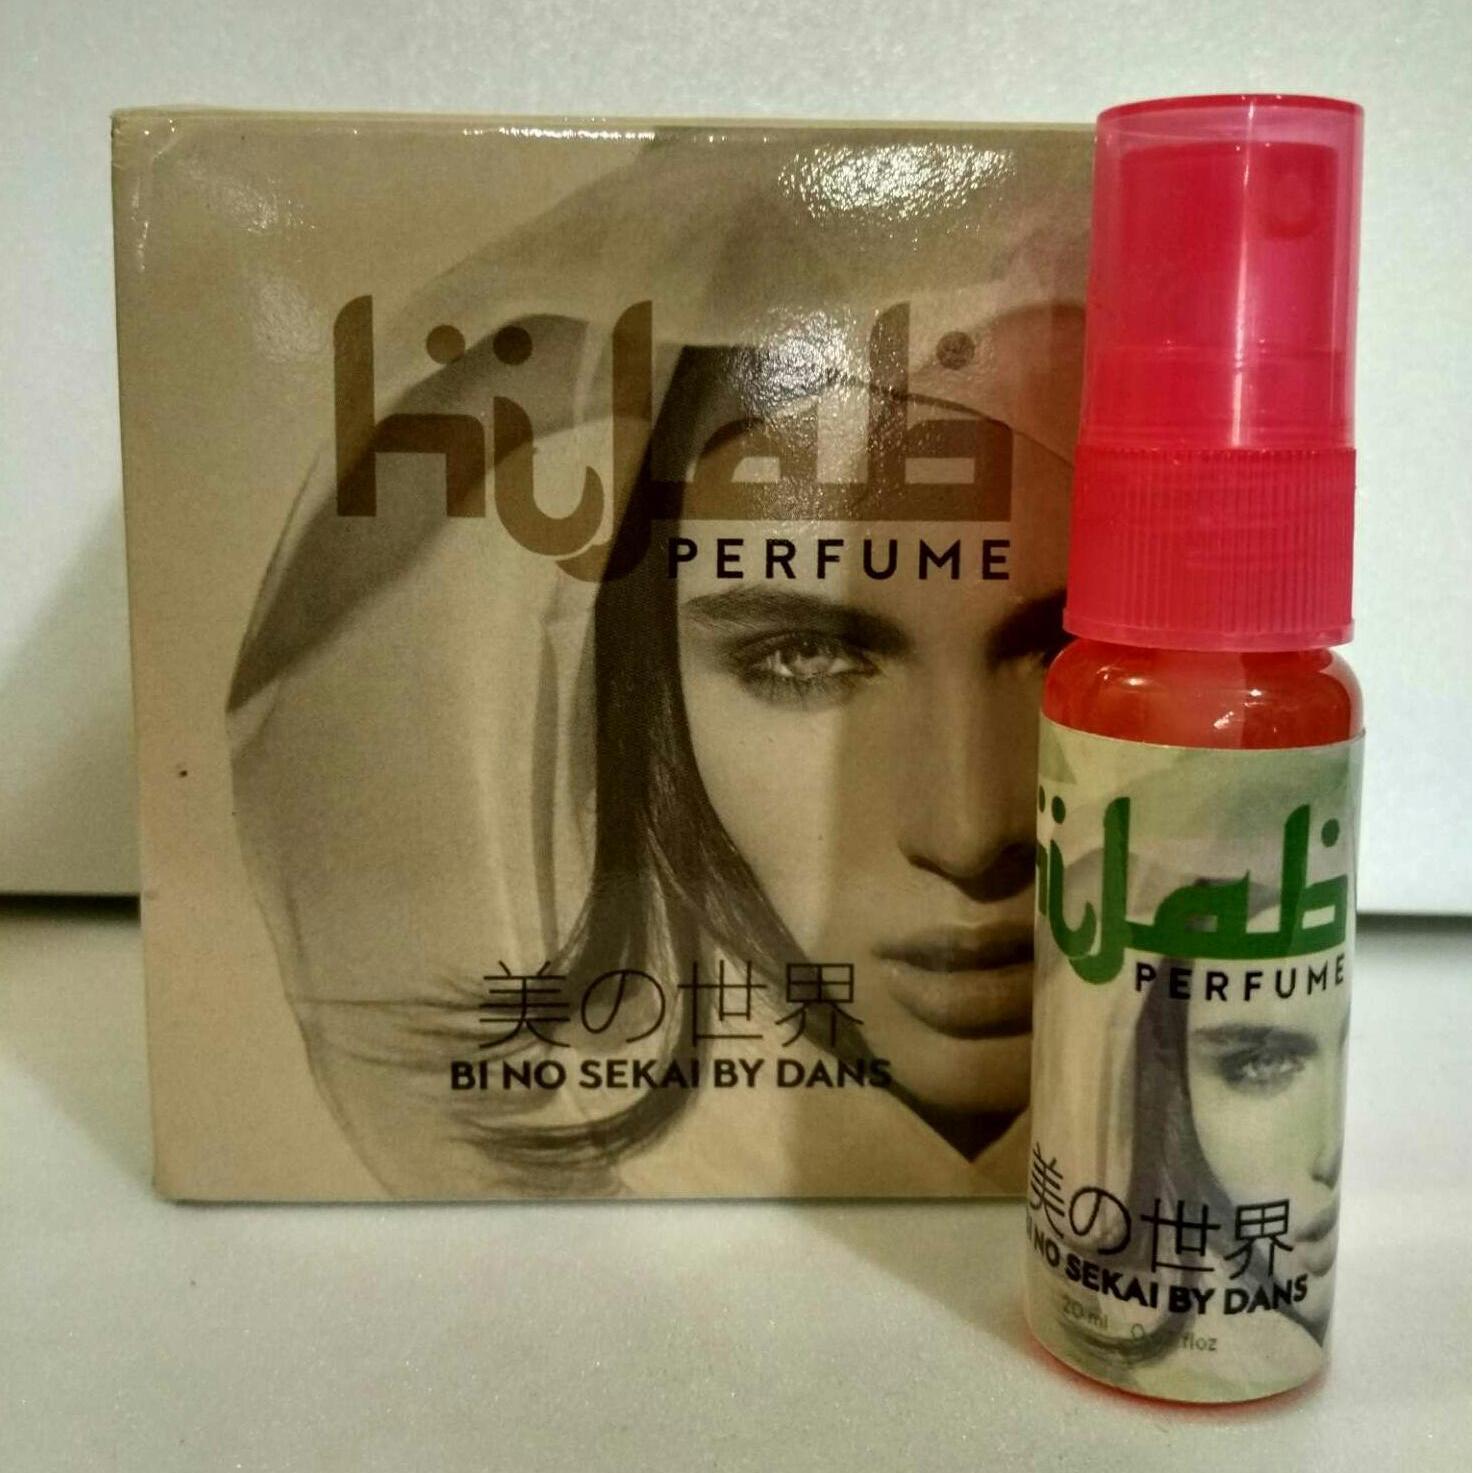 Fitur Parfum Sholat Zaym Paket Promo Isi 3 Varian Non Alkohol Dan Hijab Wanita Wangi Tahan Lama Kerudung